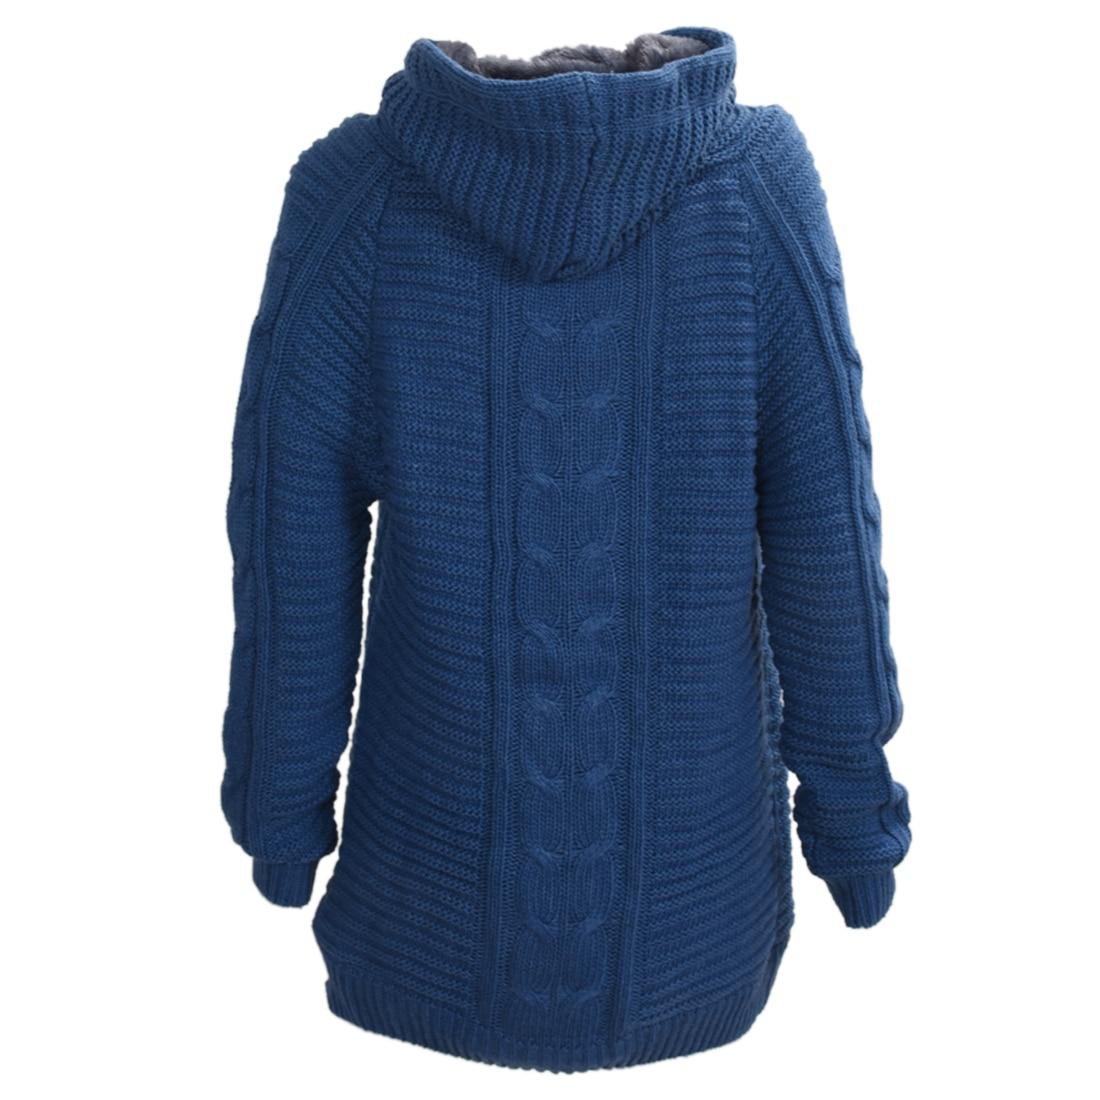 Aliexpress.com : Buy New Womens Cardigan Knit Hoodie Mid long ...